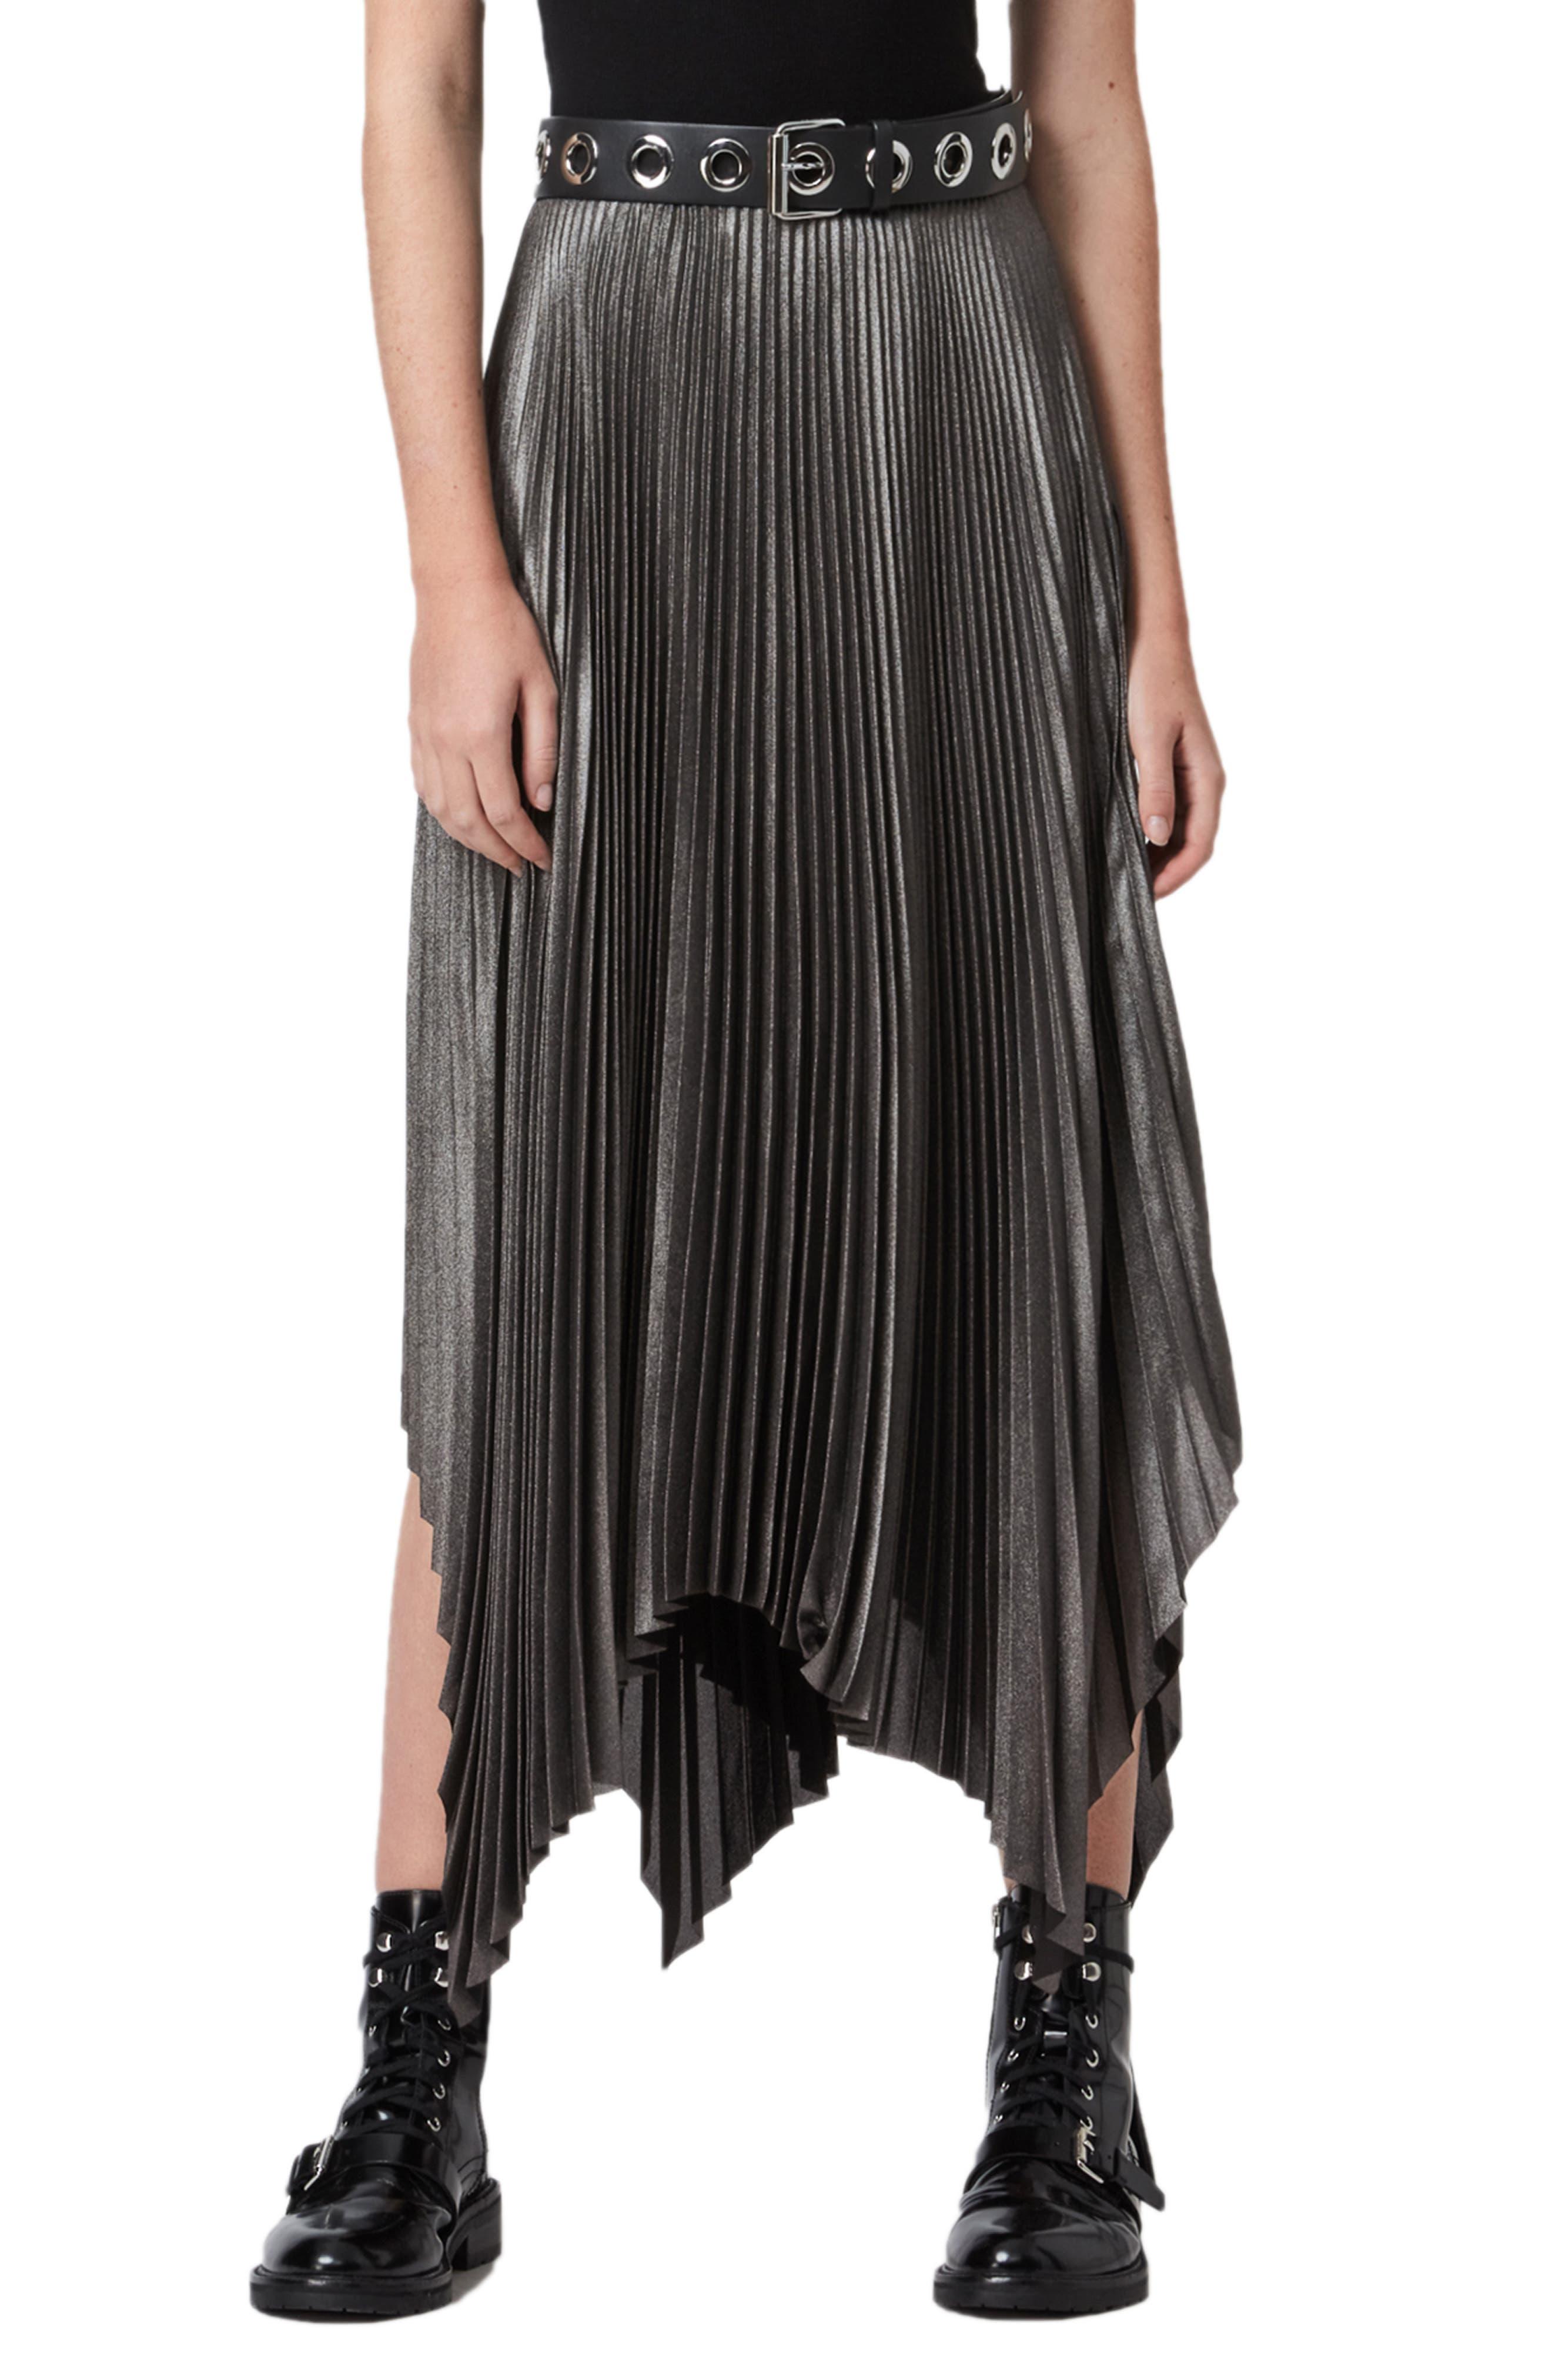 ALLSAINTS Jas Shimmer Pleated High/Low Skirt | Nordstrom